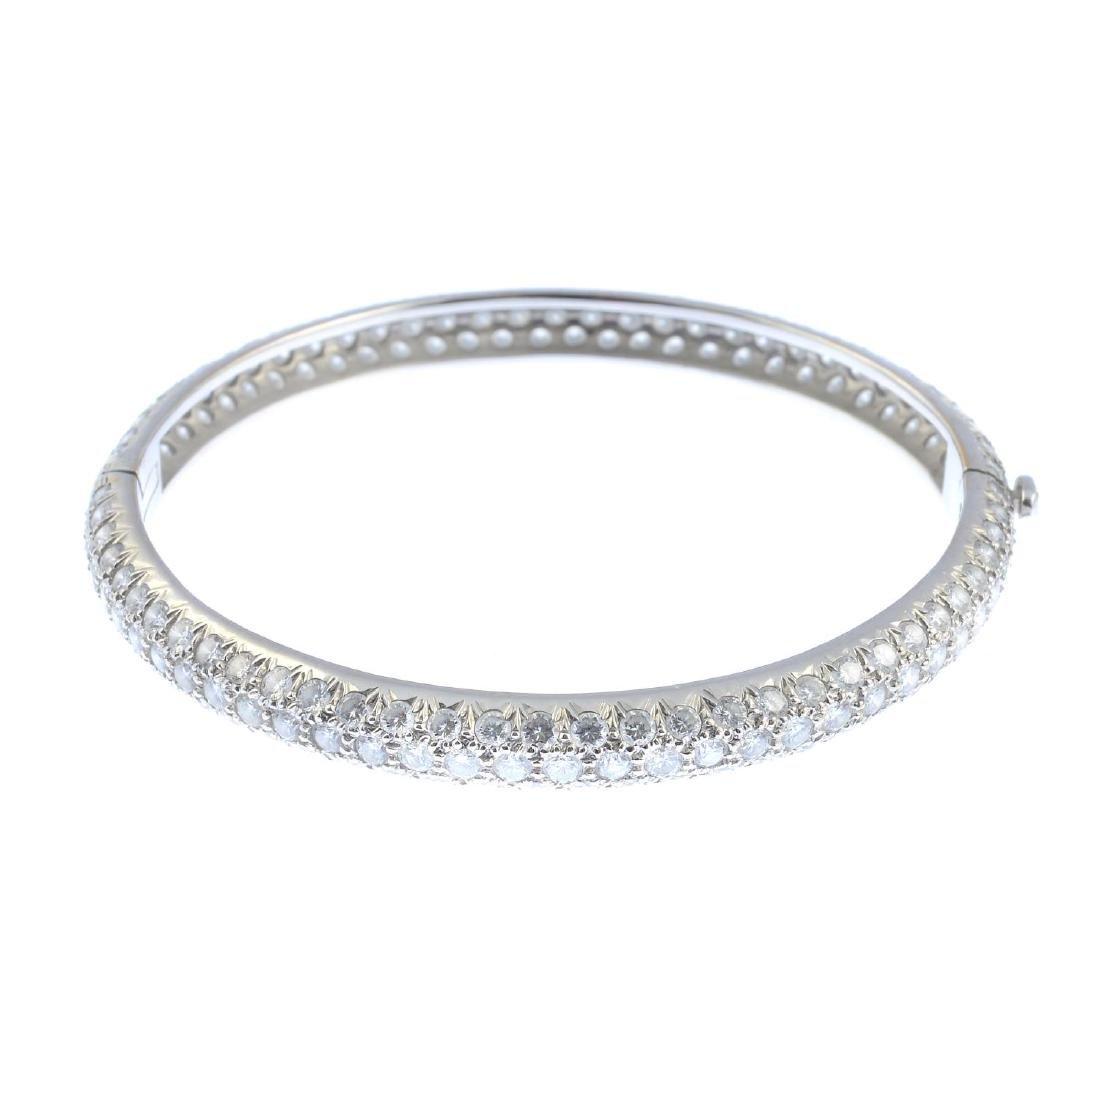 A pave-set brilliant-cut diamond hinged bangle.